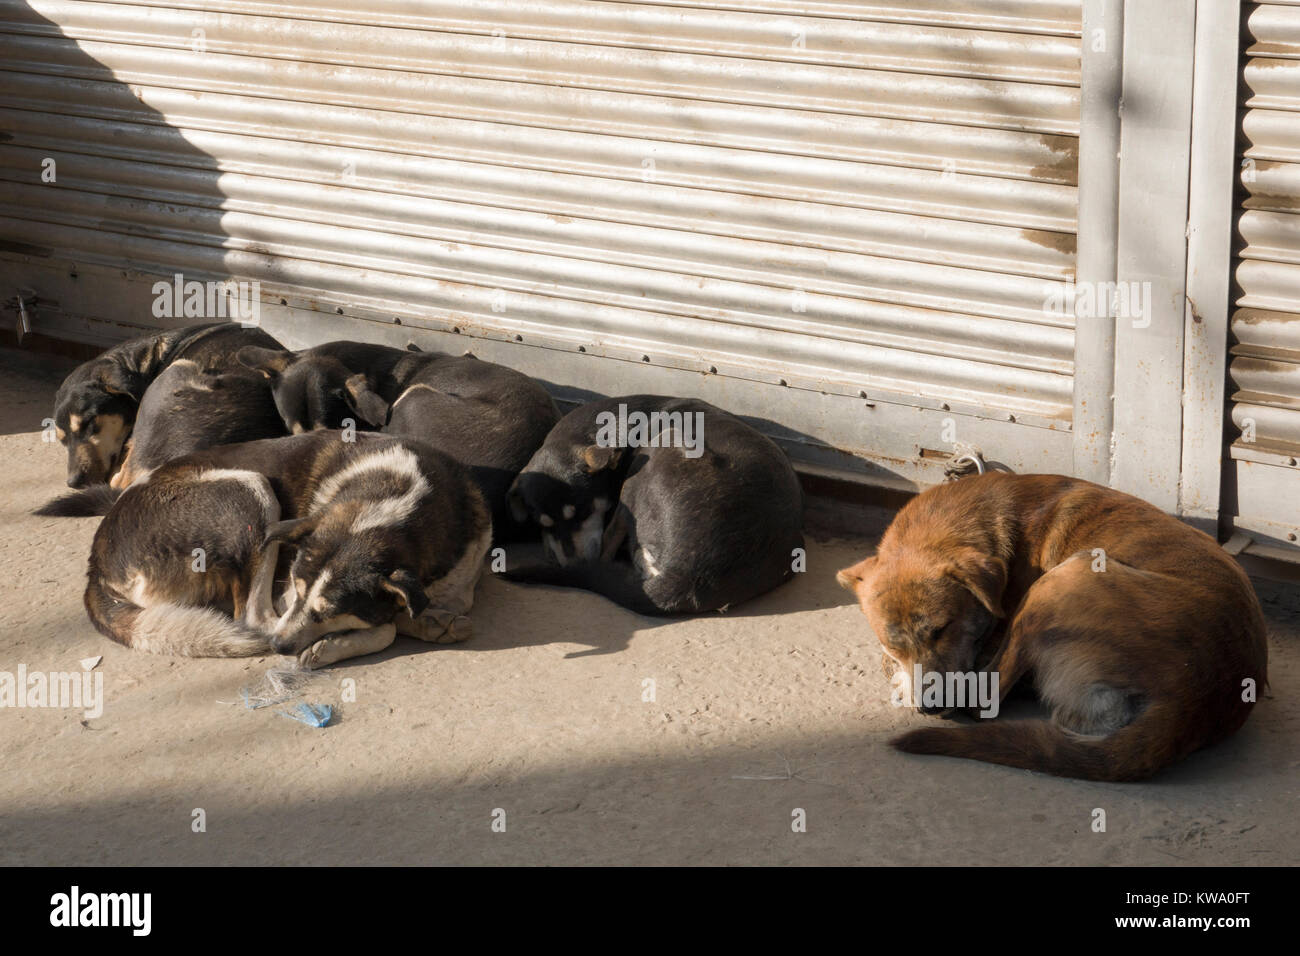 Pack of street dogs sleeping during winter in Kathmandu, Nepal Stock Photo